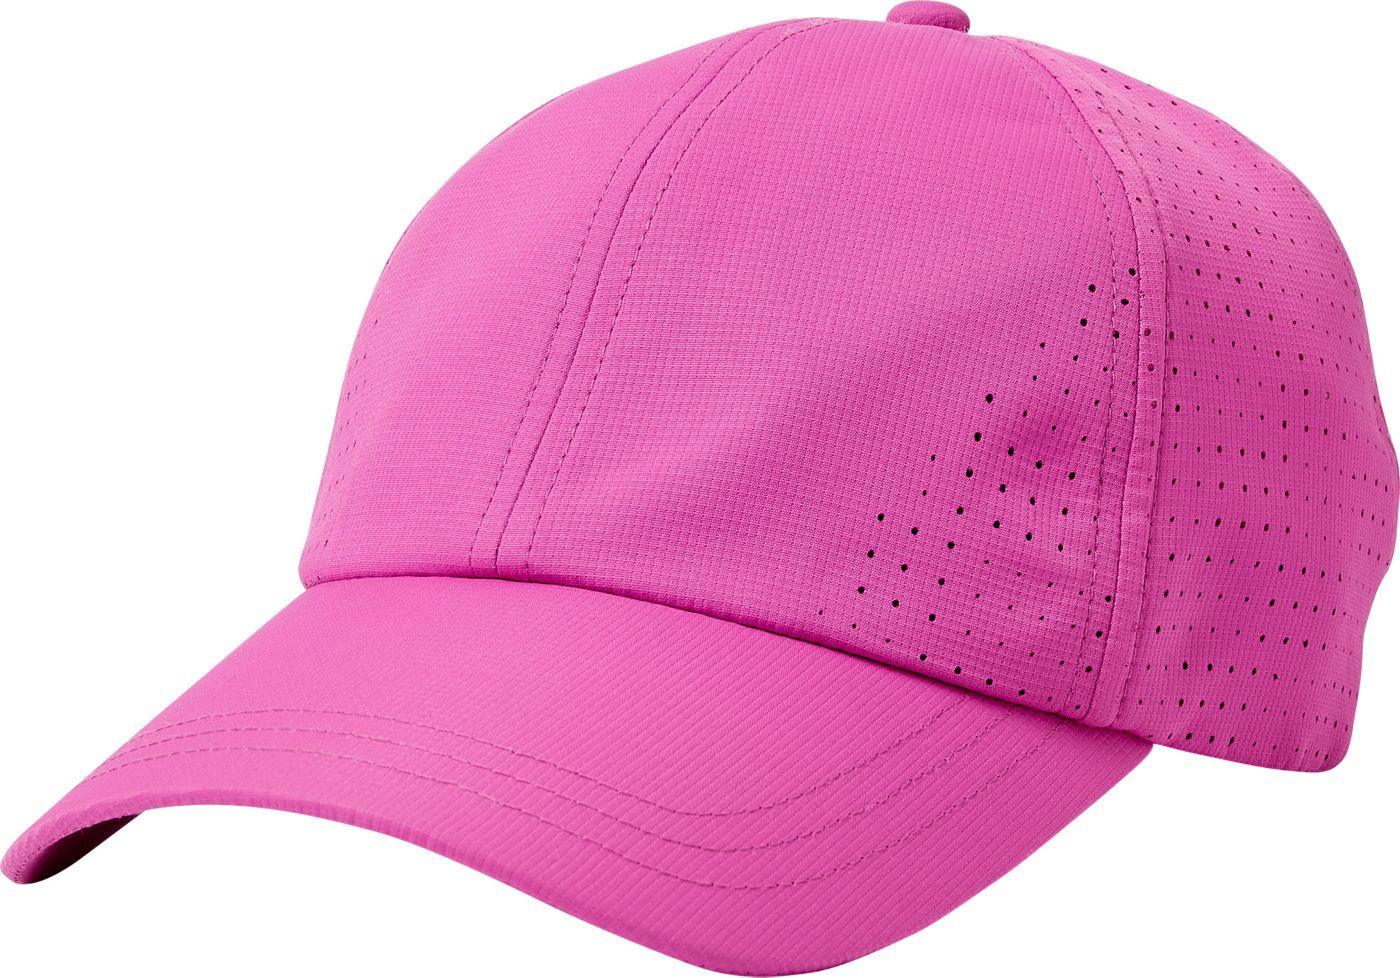 Slazenger Women's Tech Perforated Hat